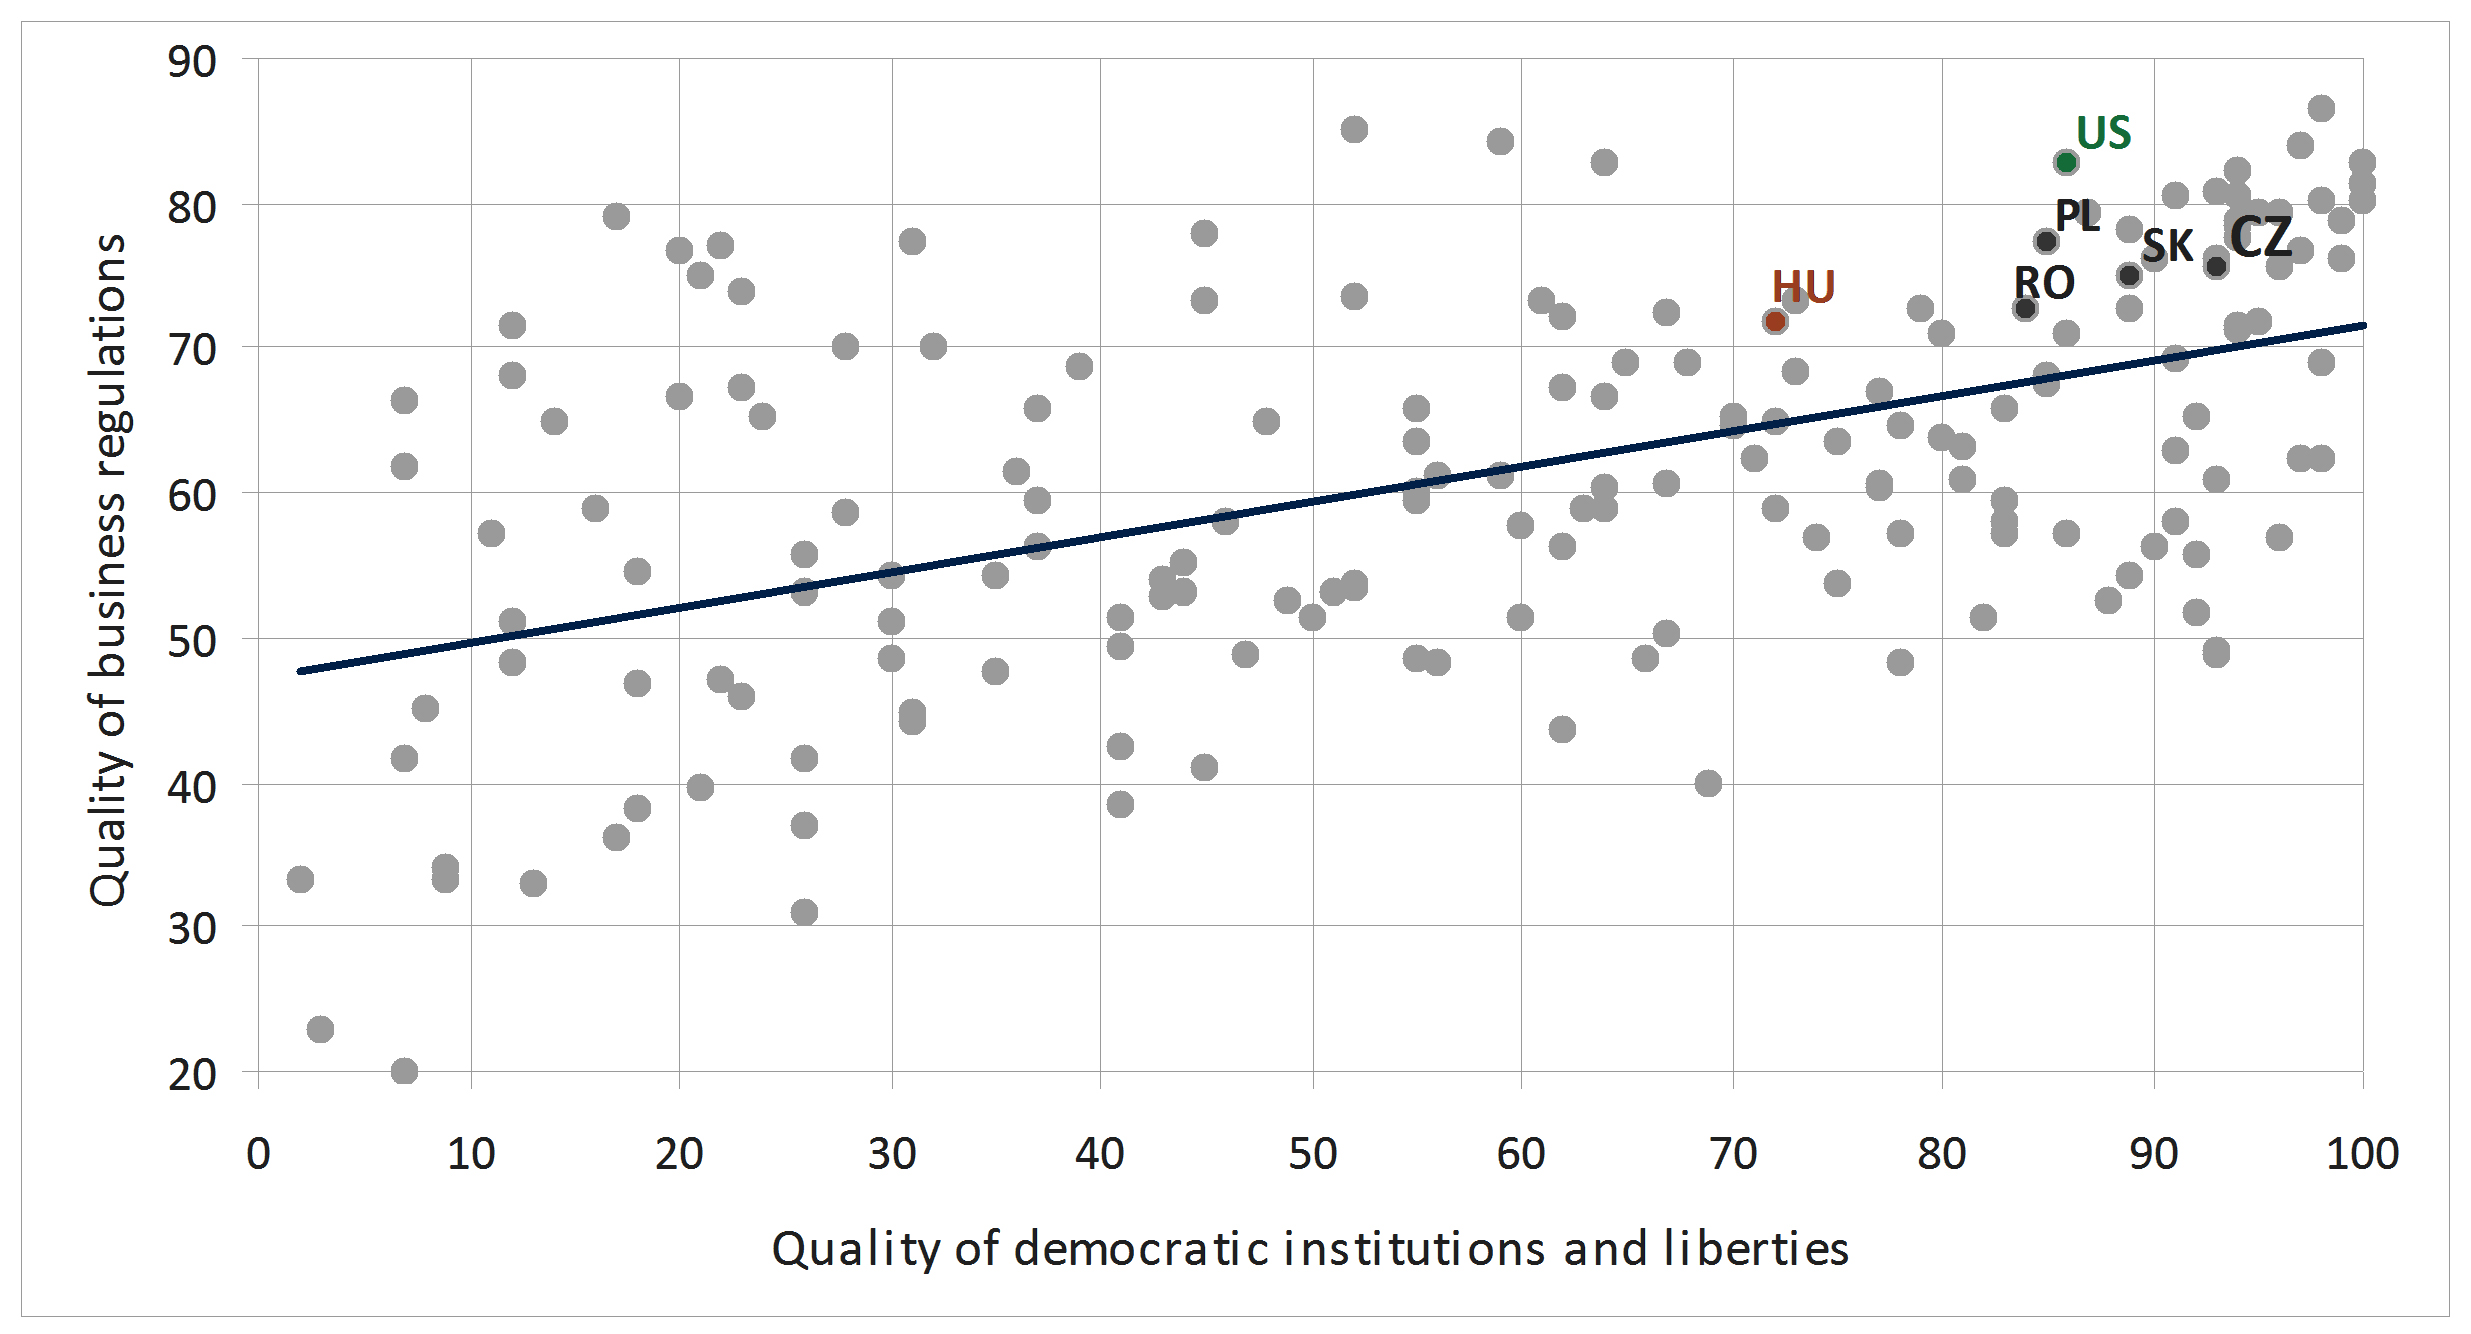 Do civil liberties contribute to economic growth?